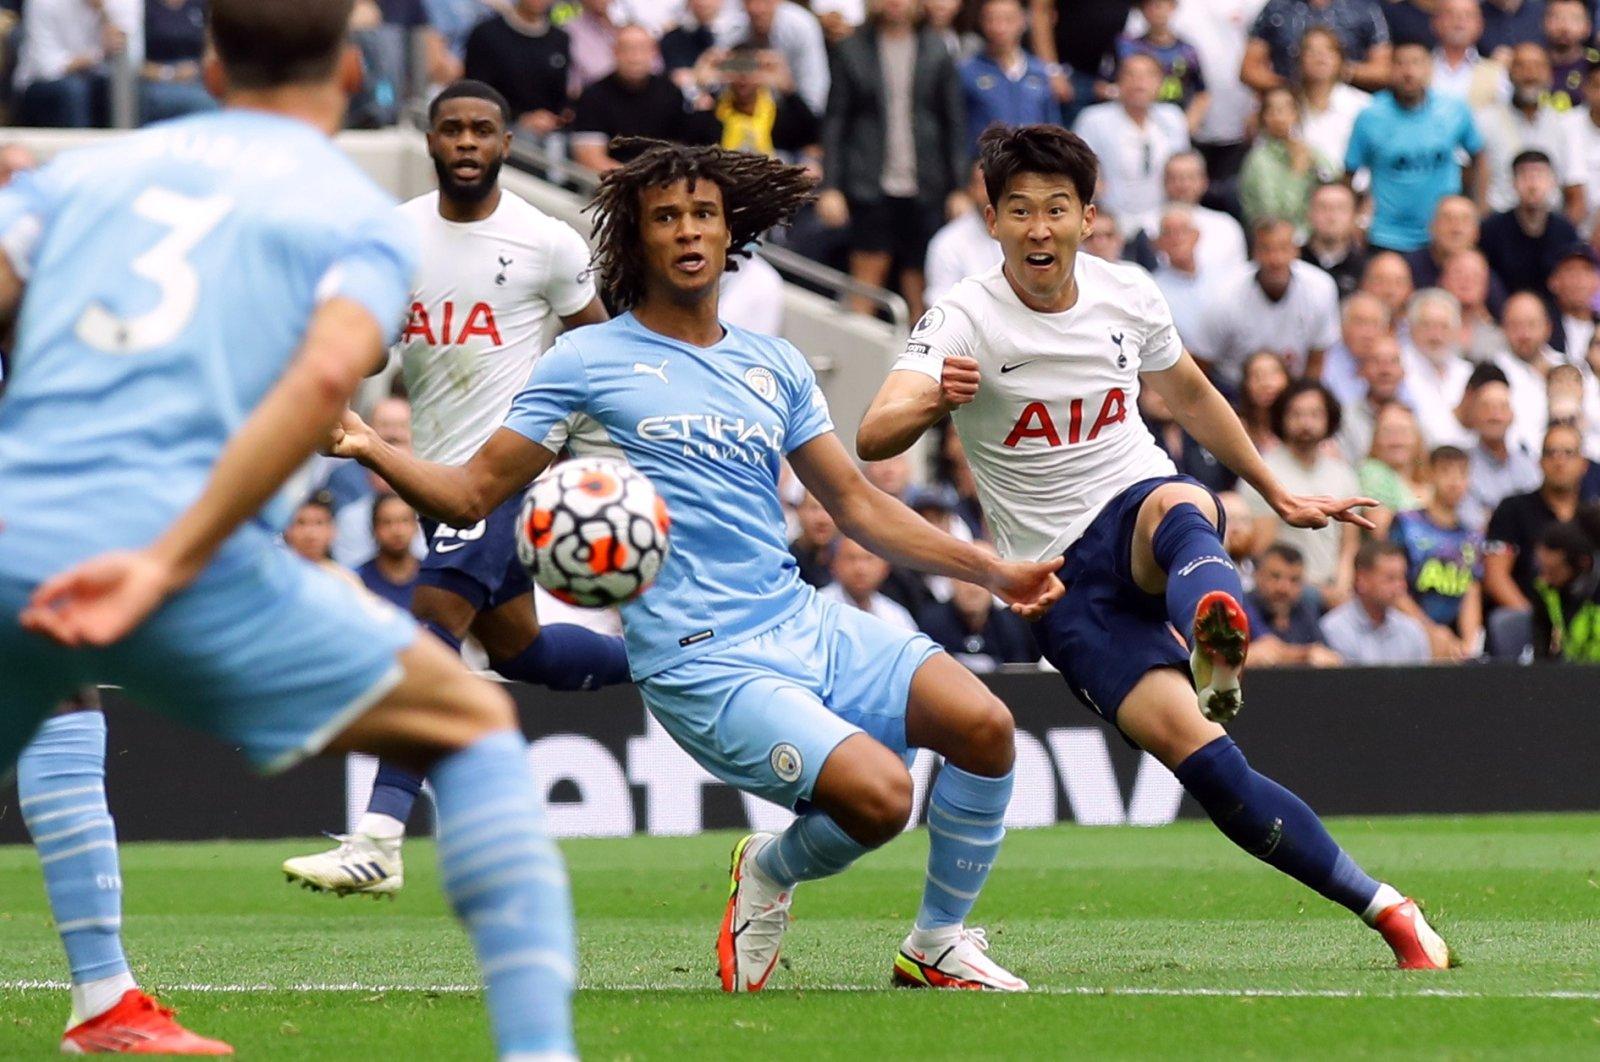 Tottenham Hotspur's Son Heung-min scores his side's only goal in a Premier League match against Manchester City, Tottenham Hotspur Stadium, London, Britain, Aug. 15, 2021.